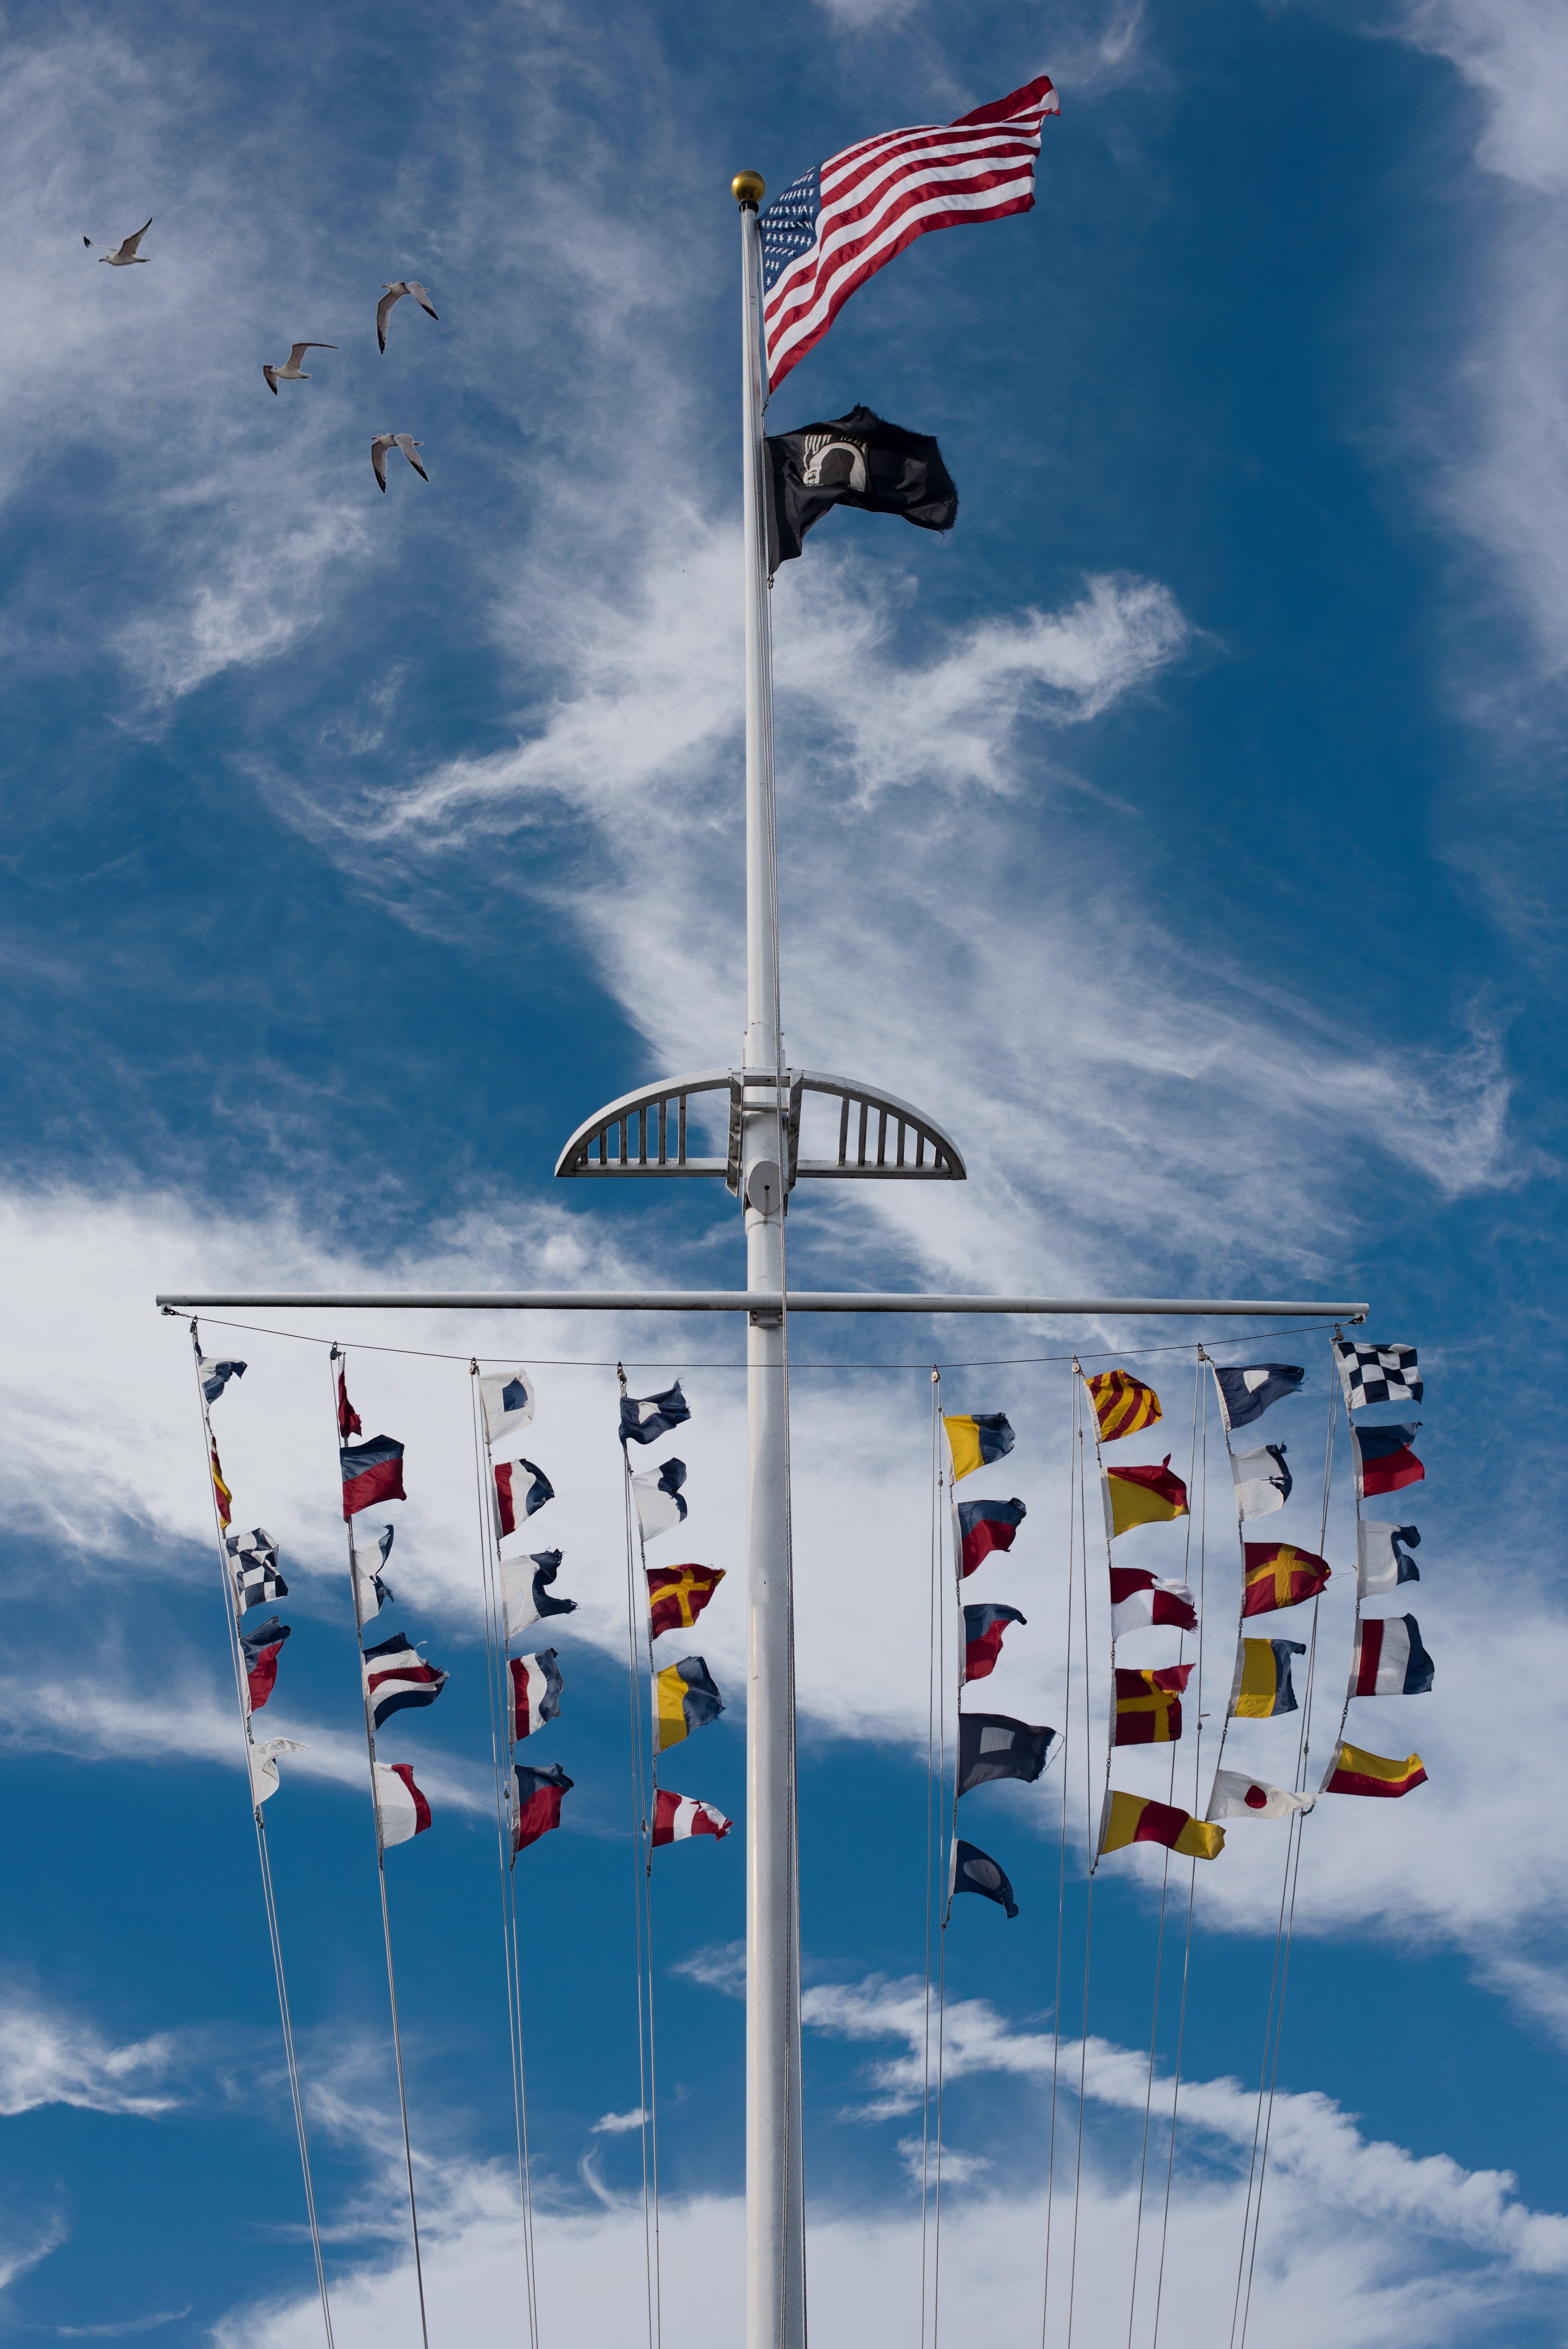 Free stock photo of American flag, beach, birds, breezy